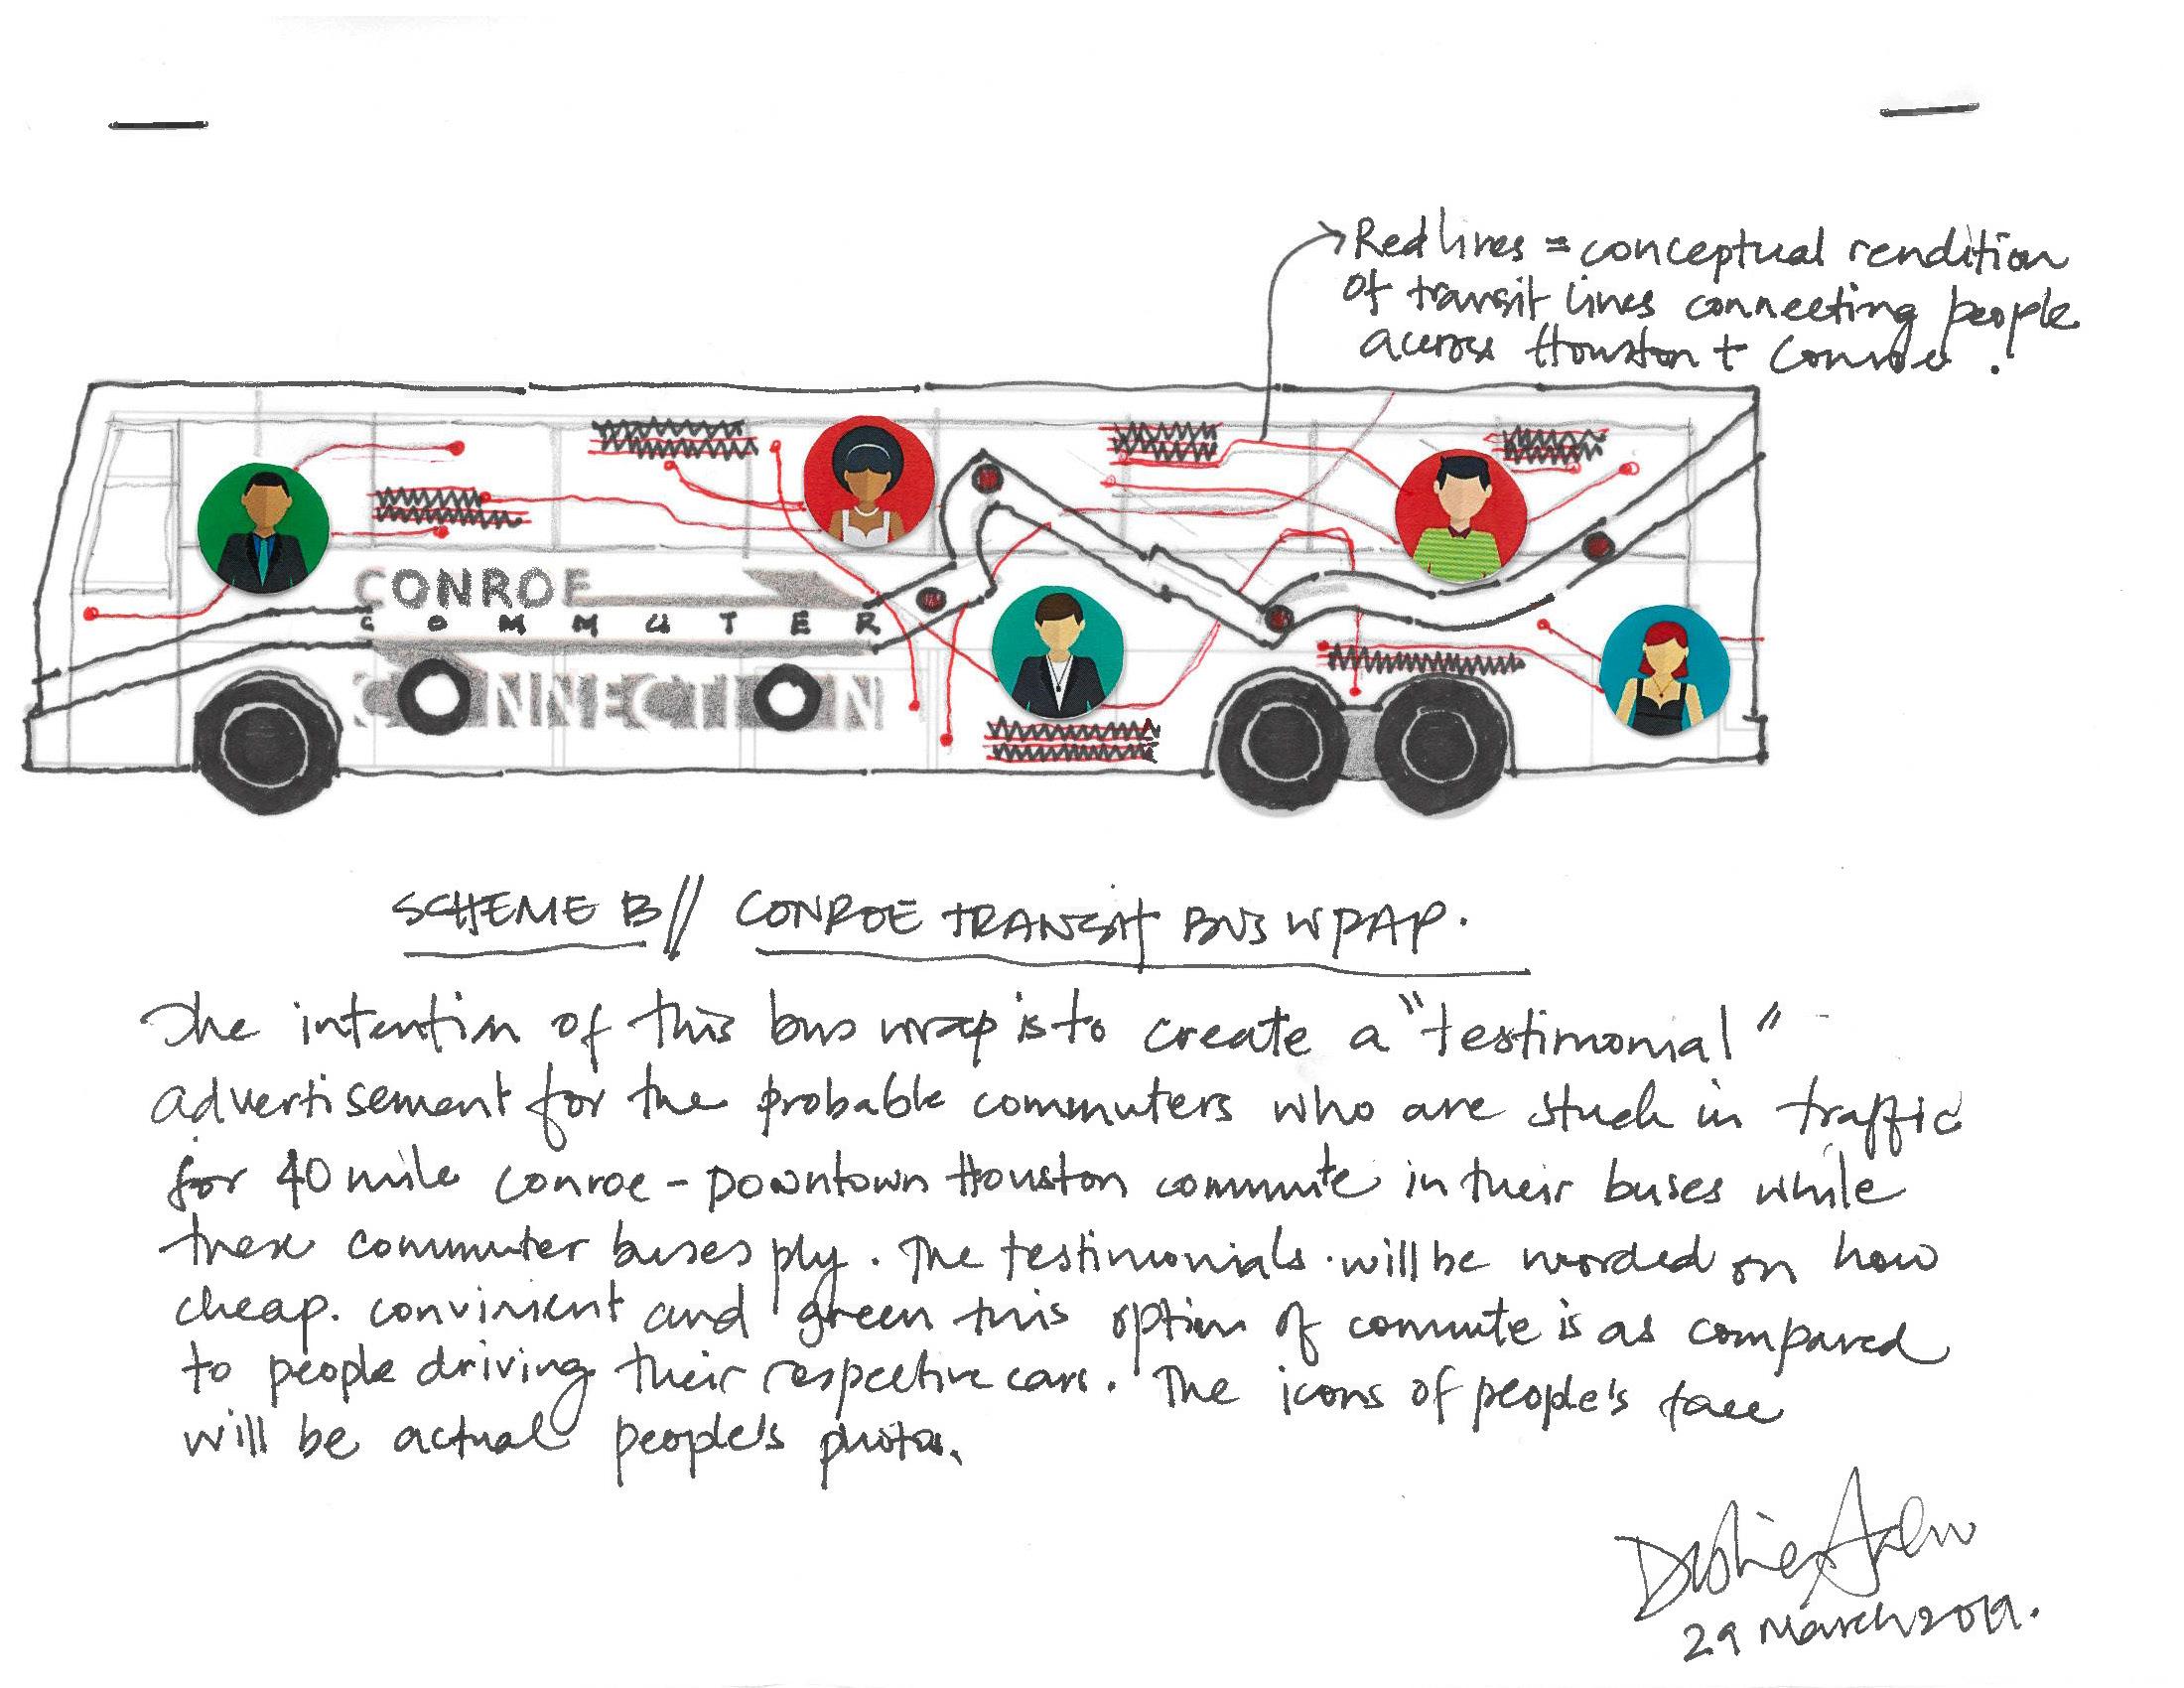 Conroe Bus Wrap 2.jpg